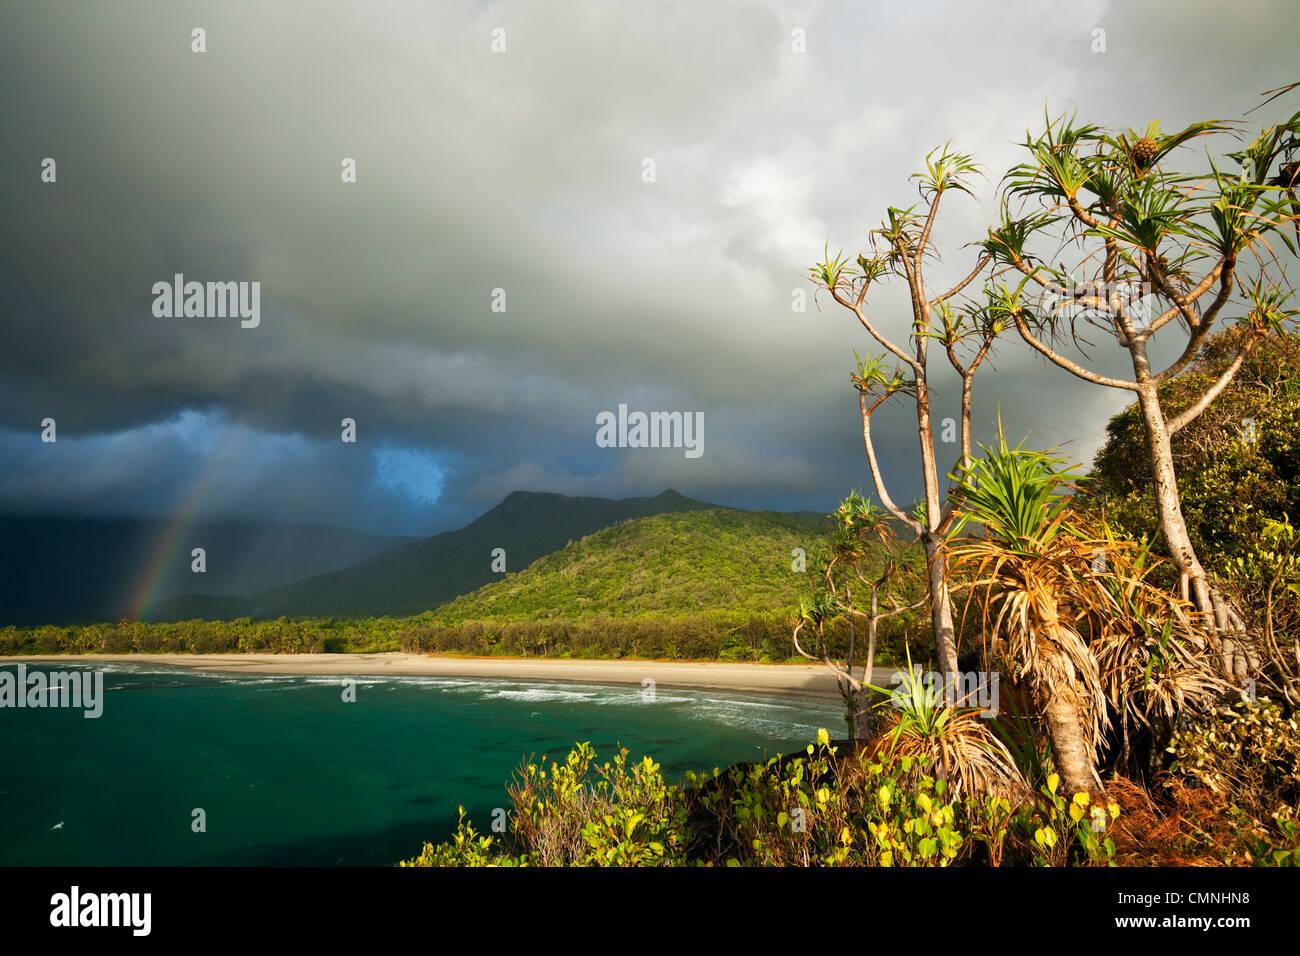 Vista de la playa Myall durante la tormenta de lluvia por la mañana. Cape Tribulation, Parque Nacional Daintree, Queensland, Australia Foto de stock